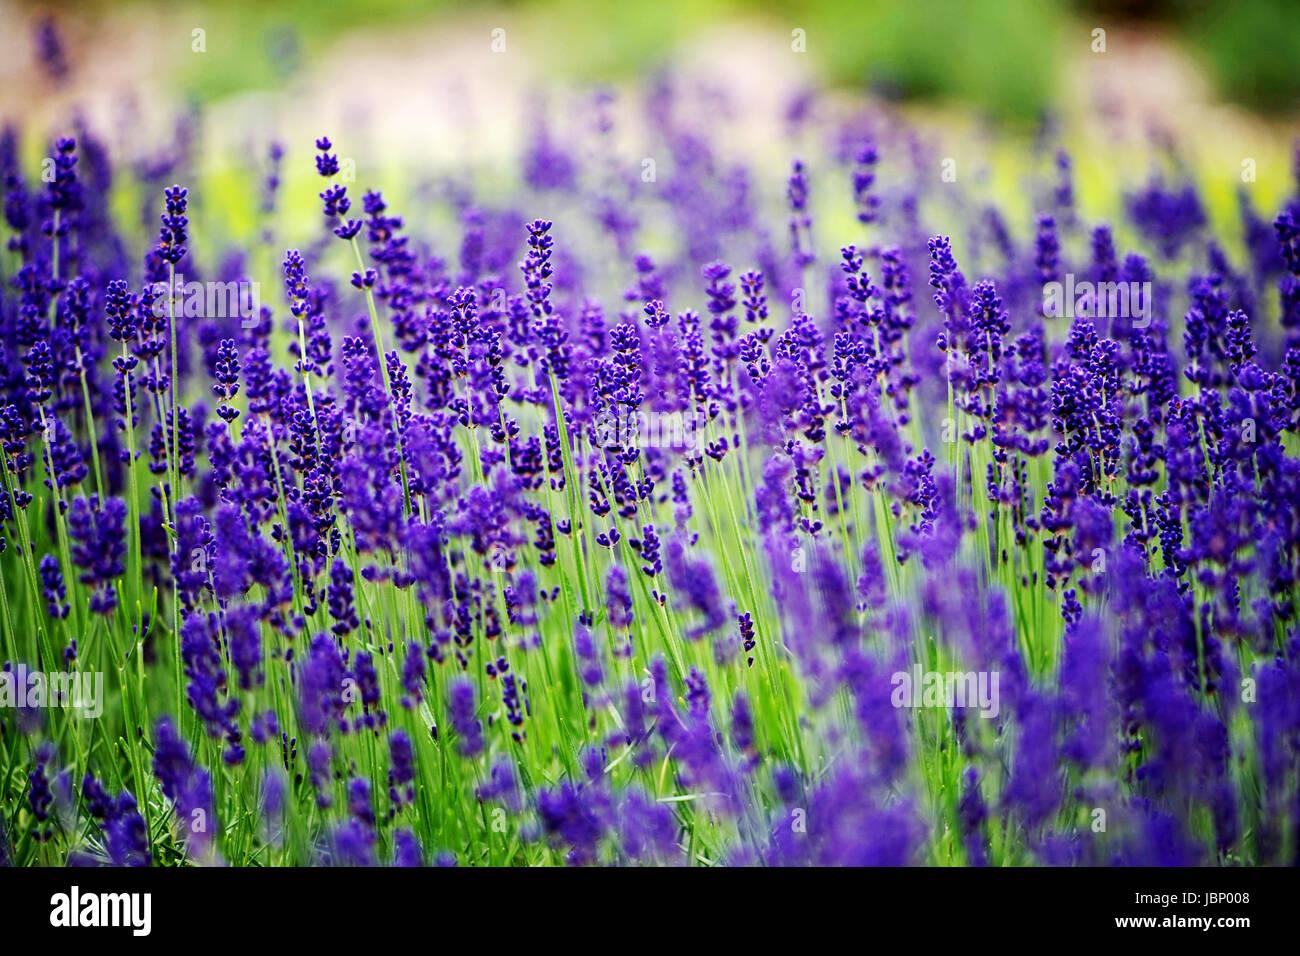 Piante di lavanda (Lavandula angustifolia) Immagini Stock